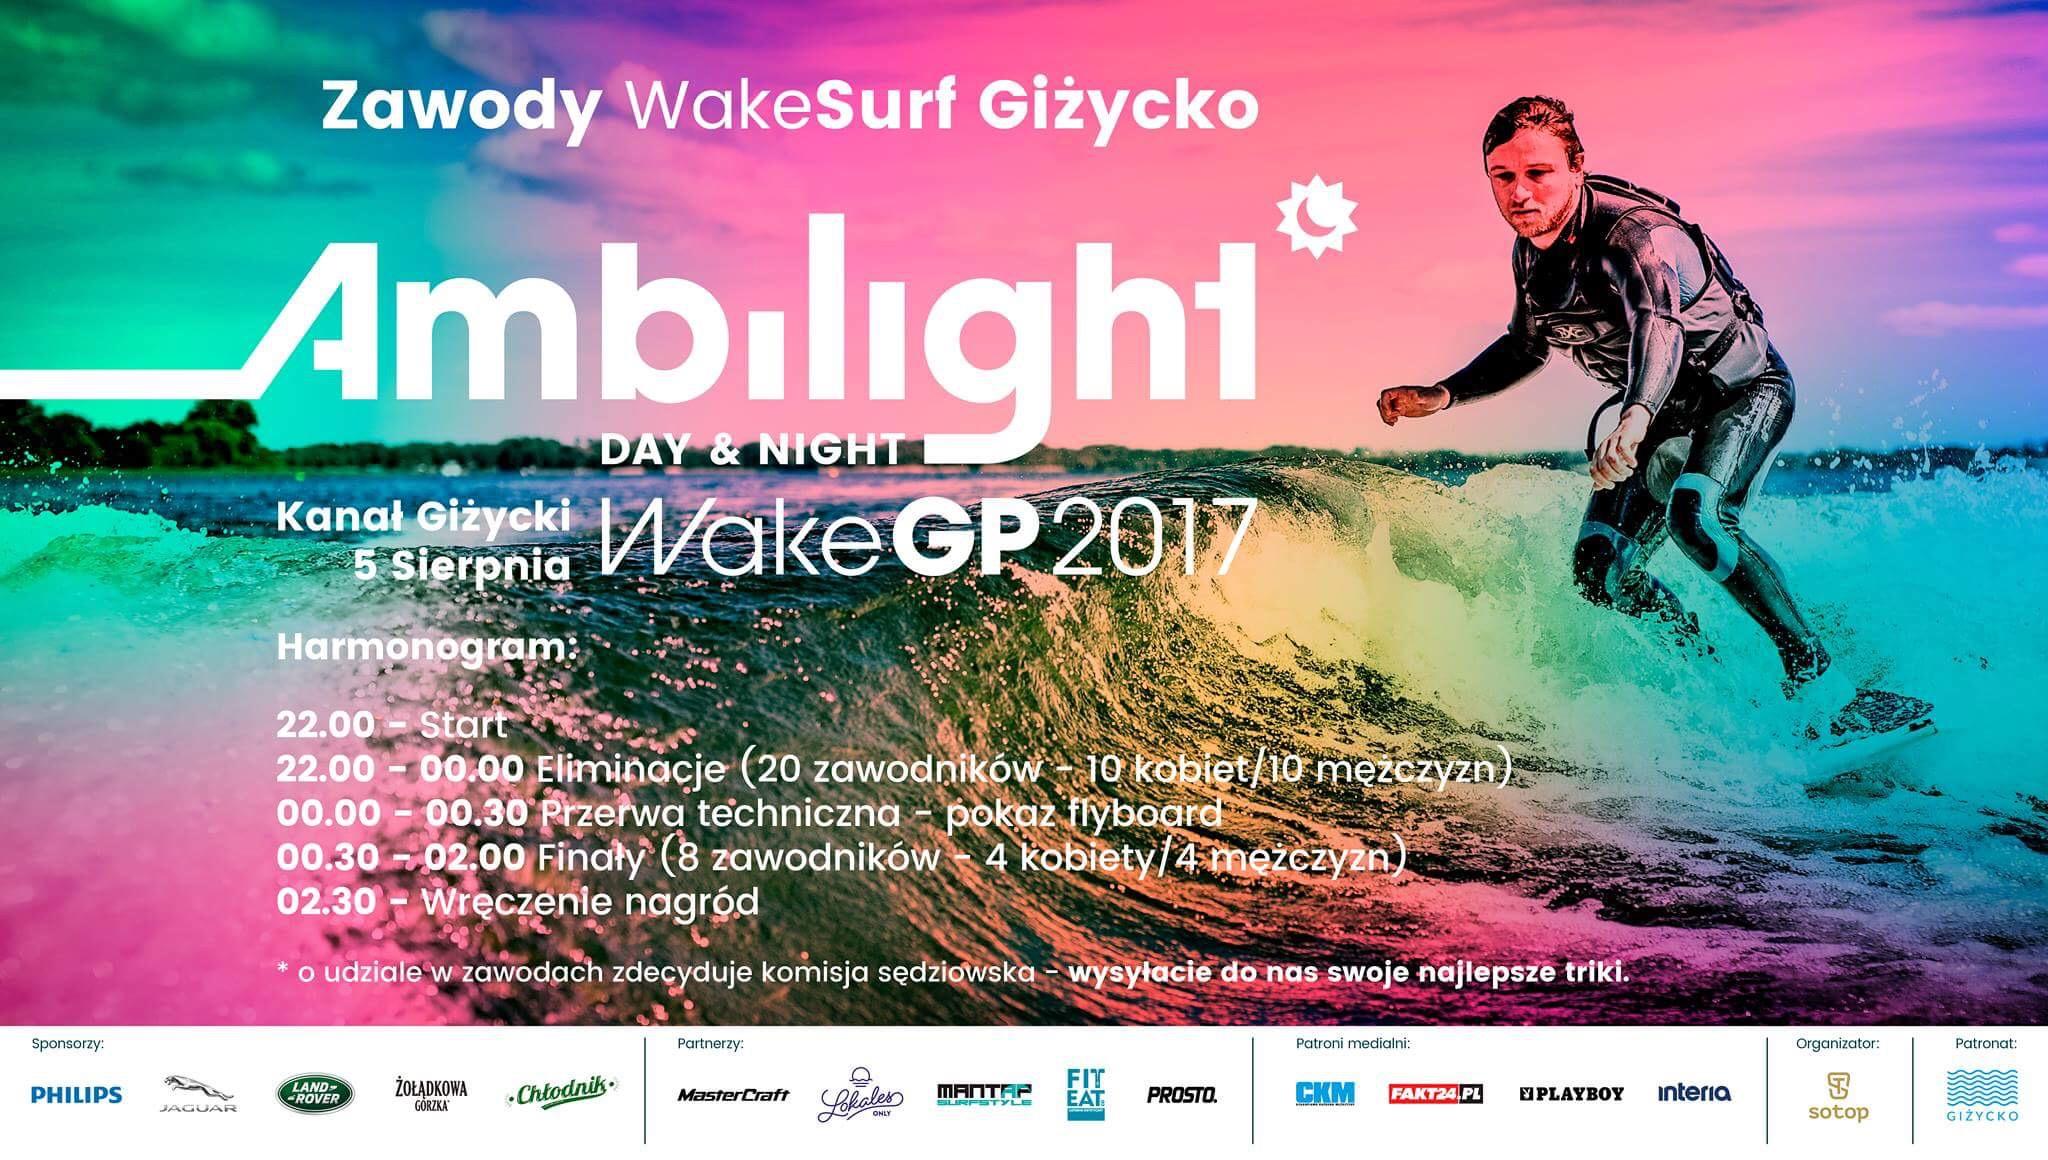 WakeGP 2017 Giżycko_Harmonogram.JPG